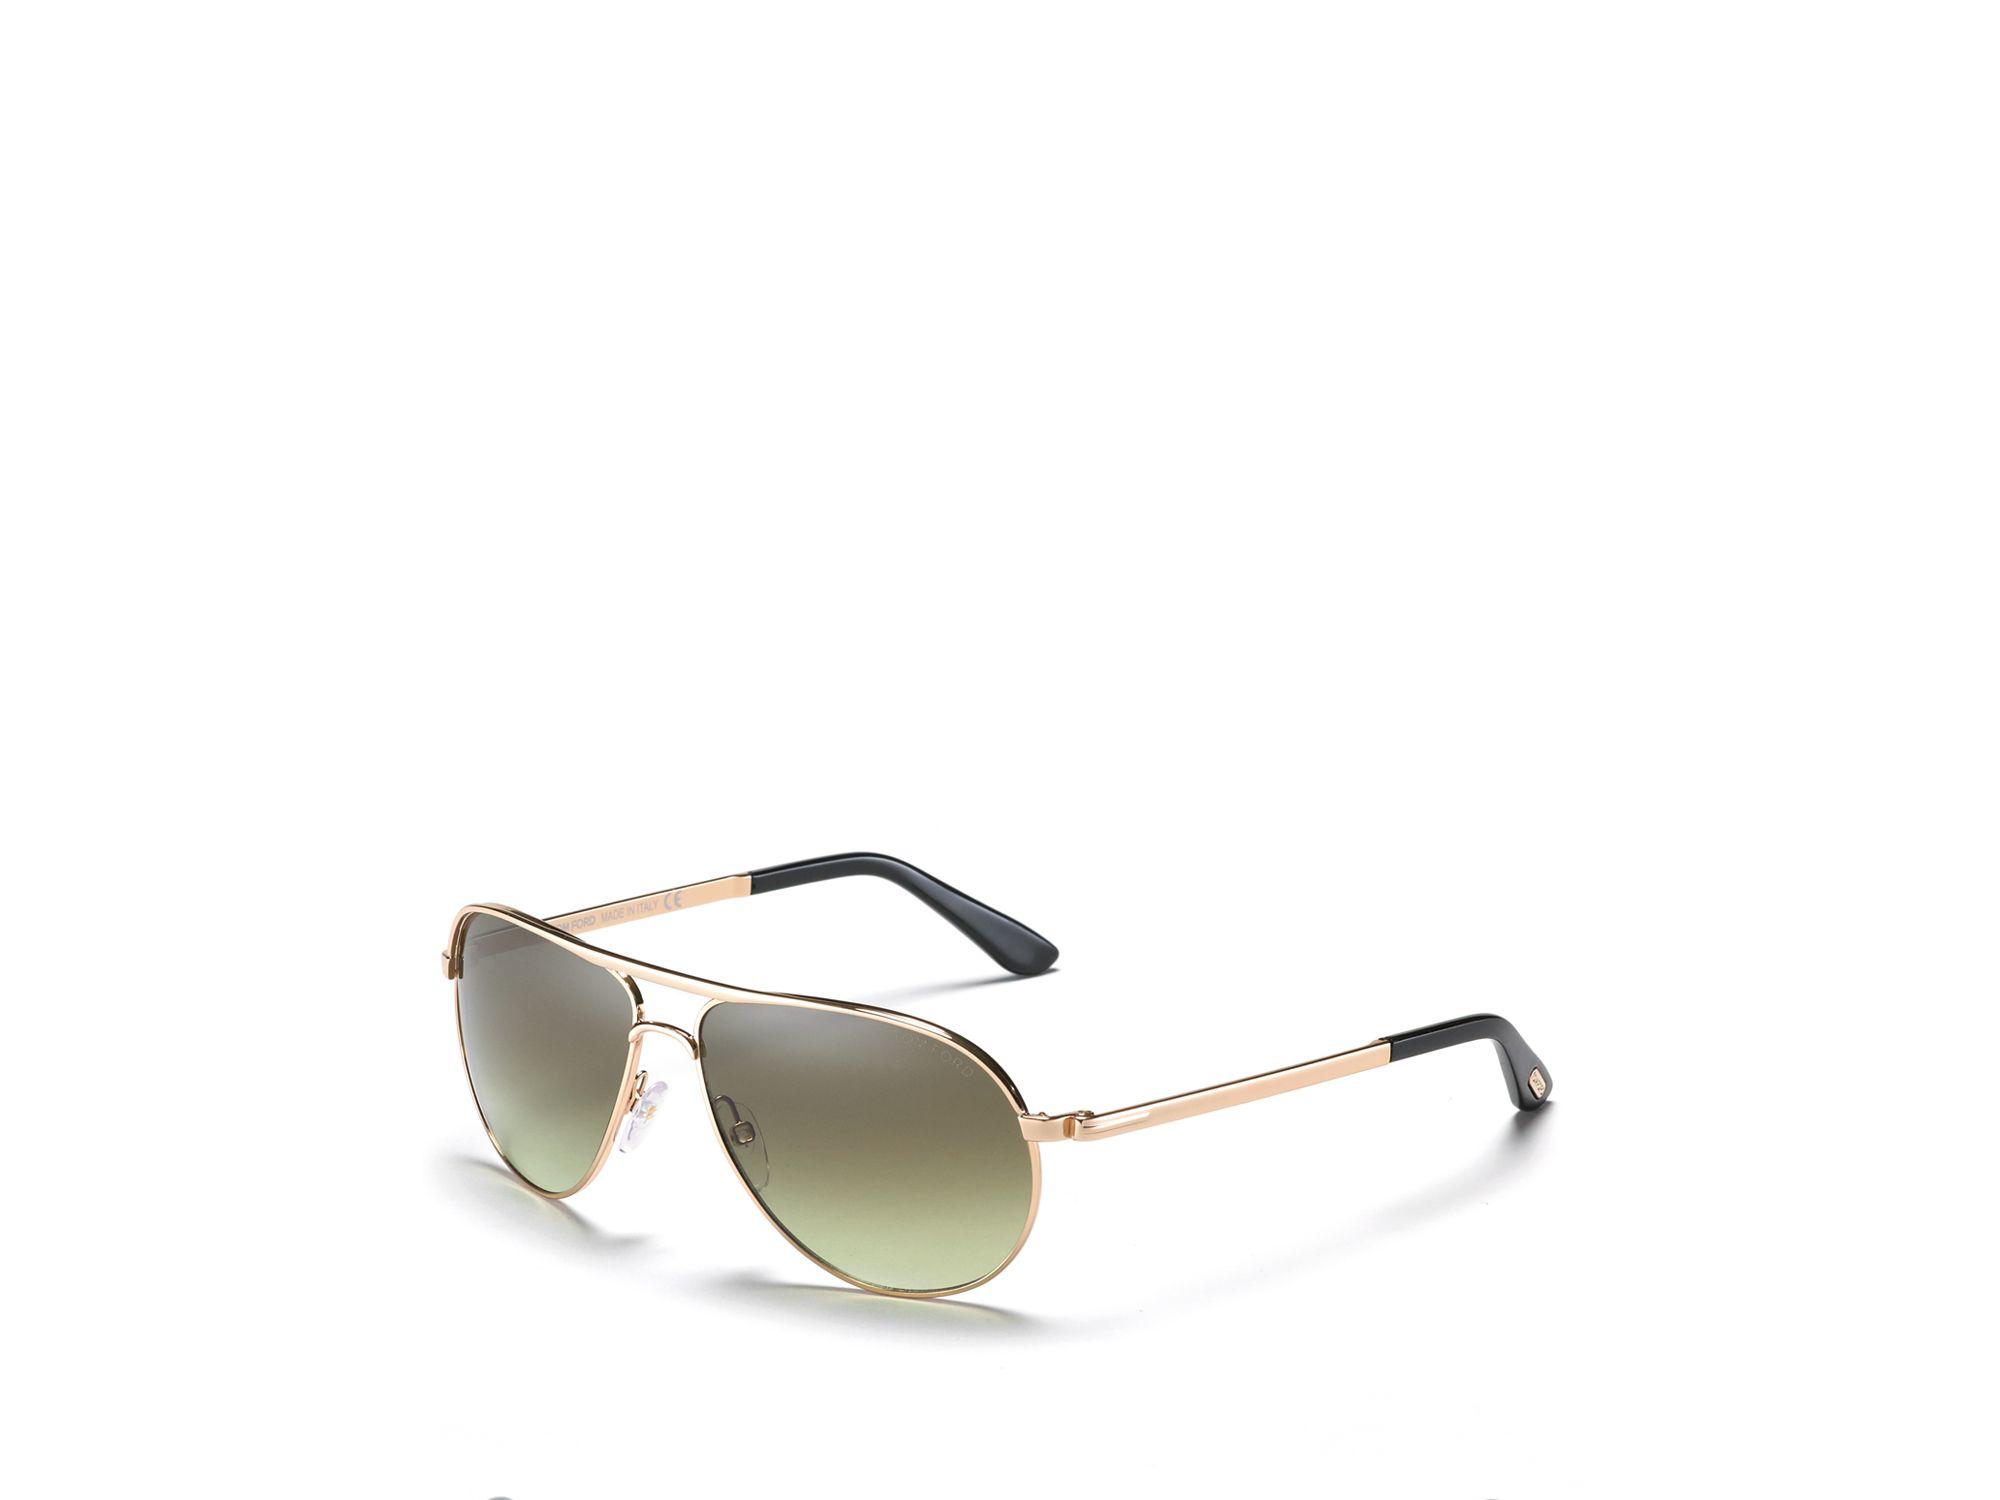 5c24ad46ca Tom Ford Marko Aviator Shiny Rose Gold Sunglasses